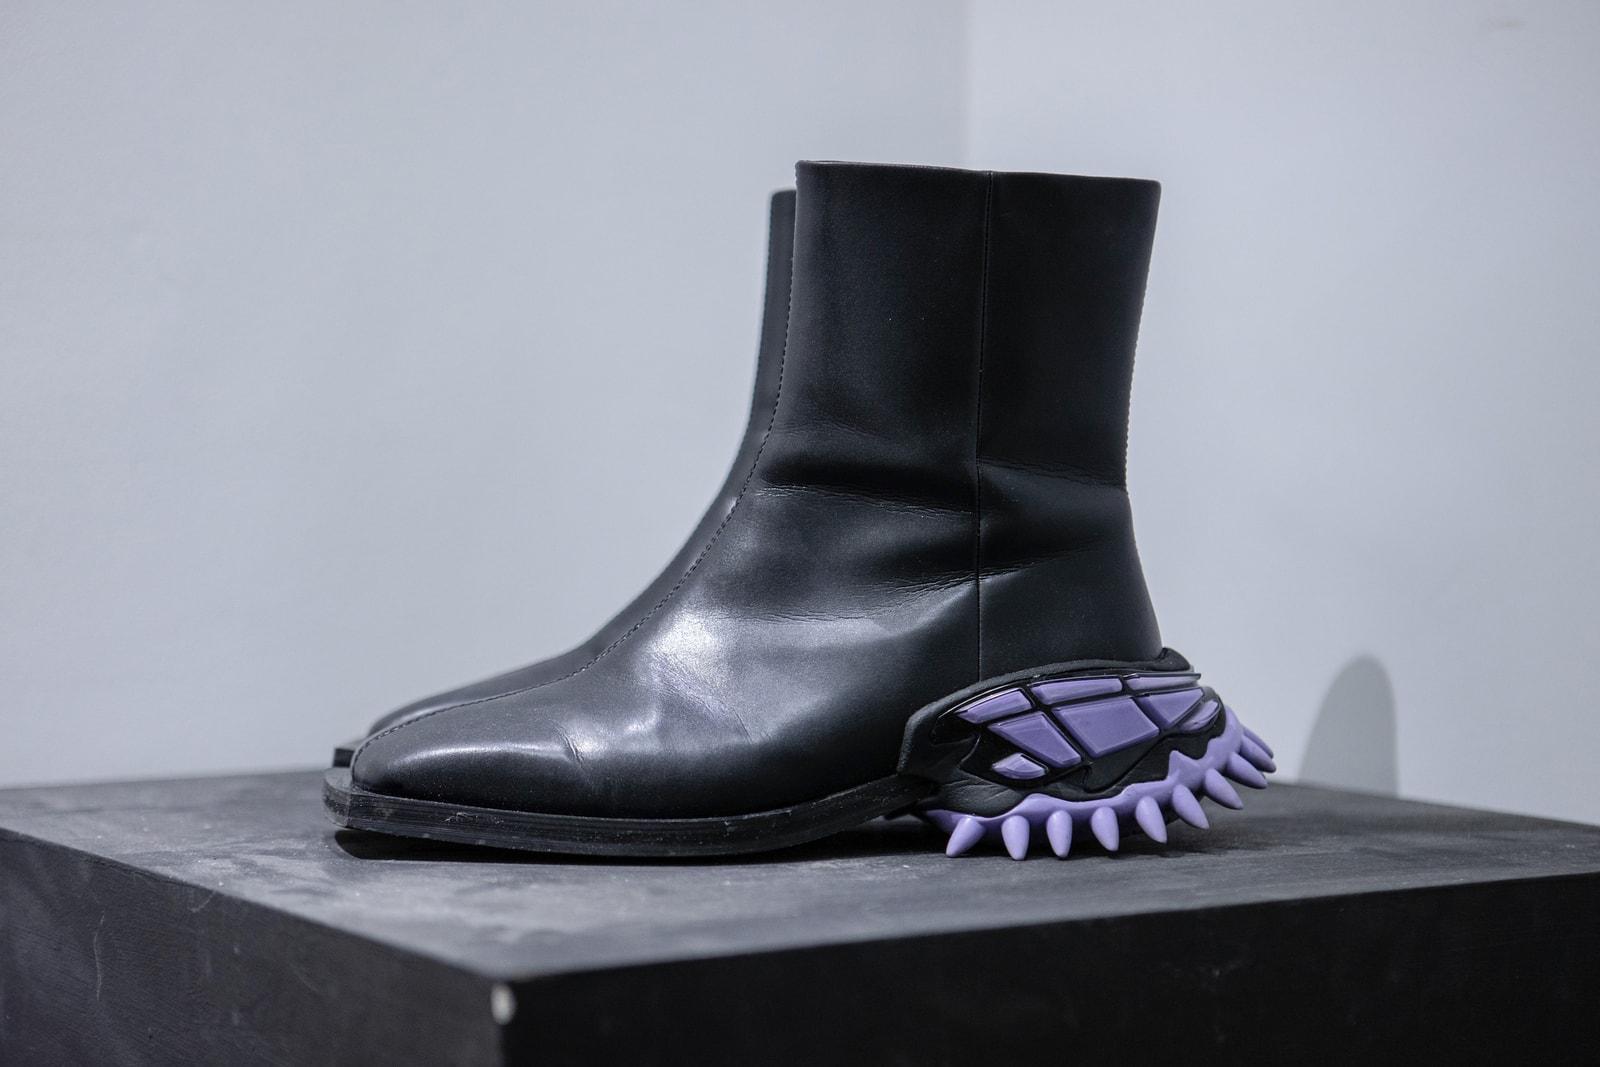 SCRY 主理人魏子雄如何通过 Shuttle 尝试球鞋设计的新可能?  Sole Mates